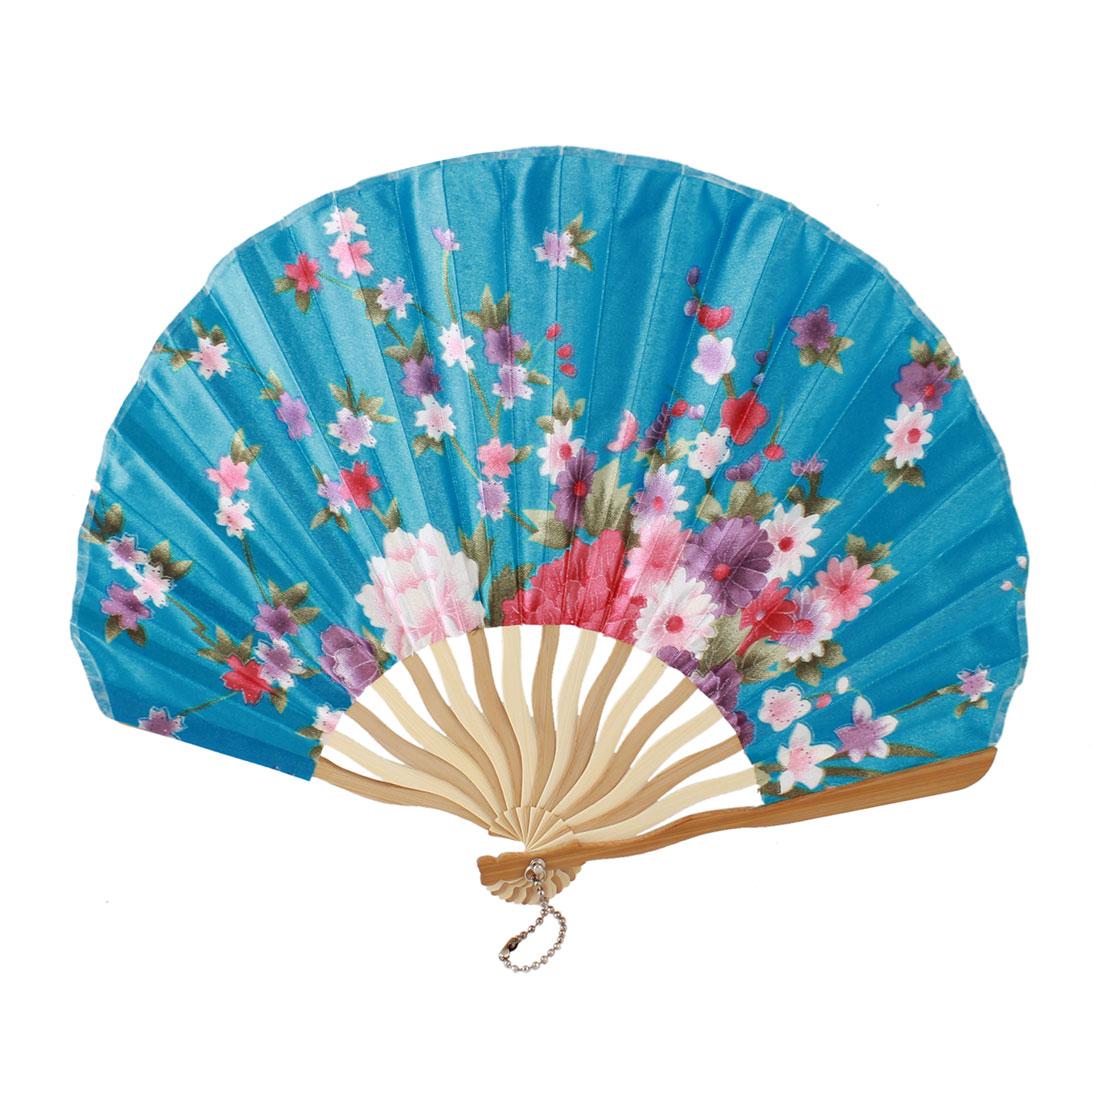 Beige Bamboo Ribs Flower Printed Seashell Shape Folding Hand Fan Teal Blue